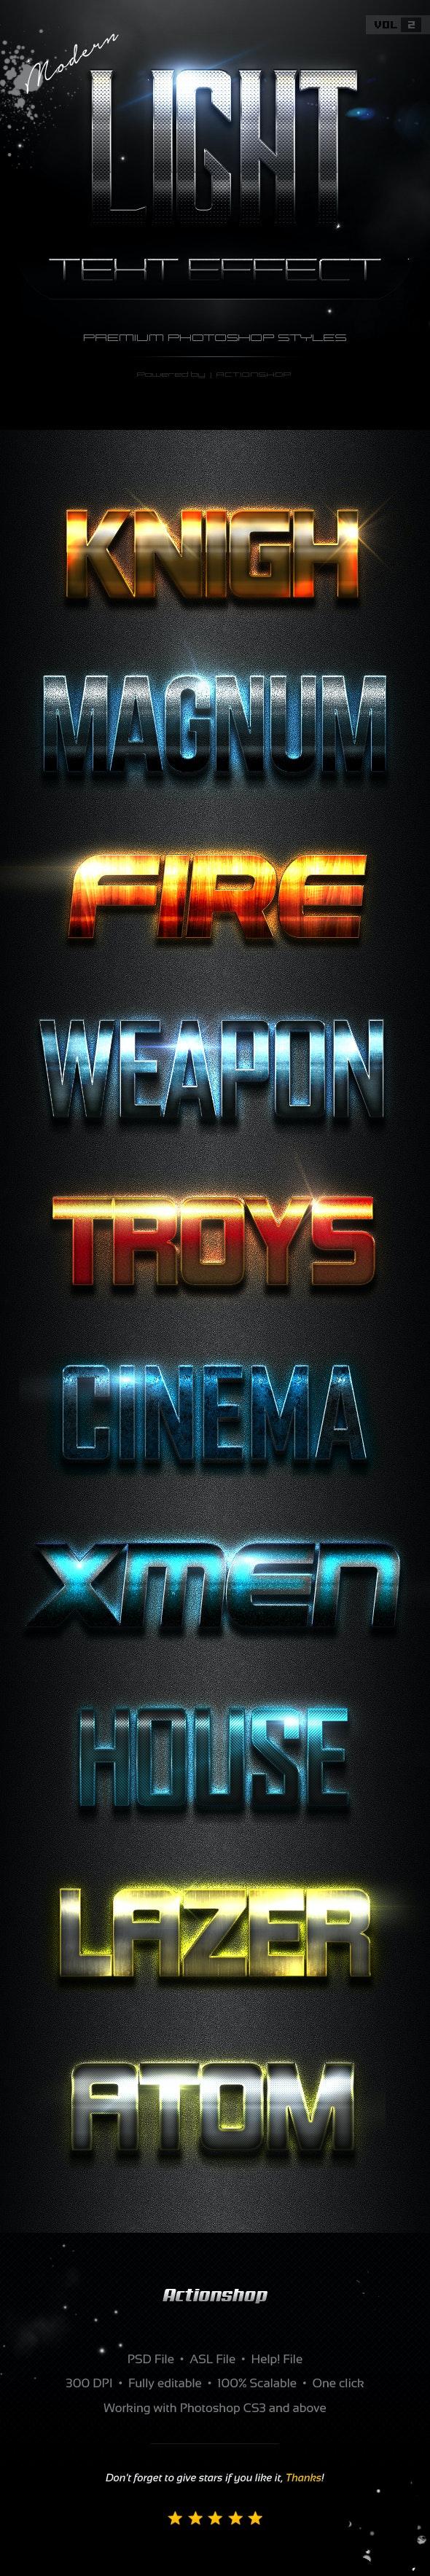 10 Modern Light Text Effects Vol.2 - Text Effects Styles